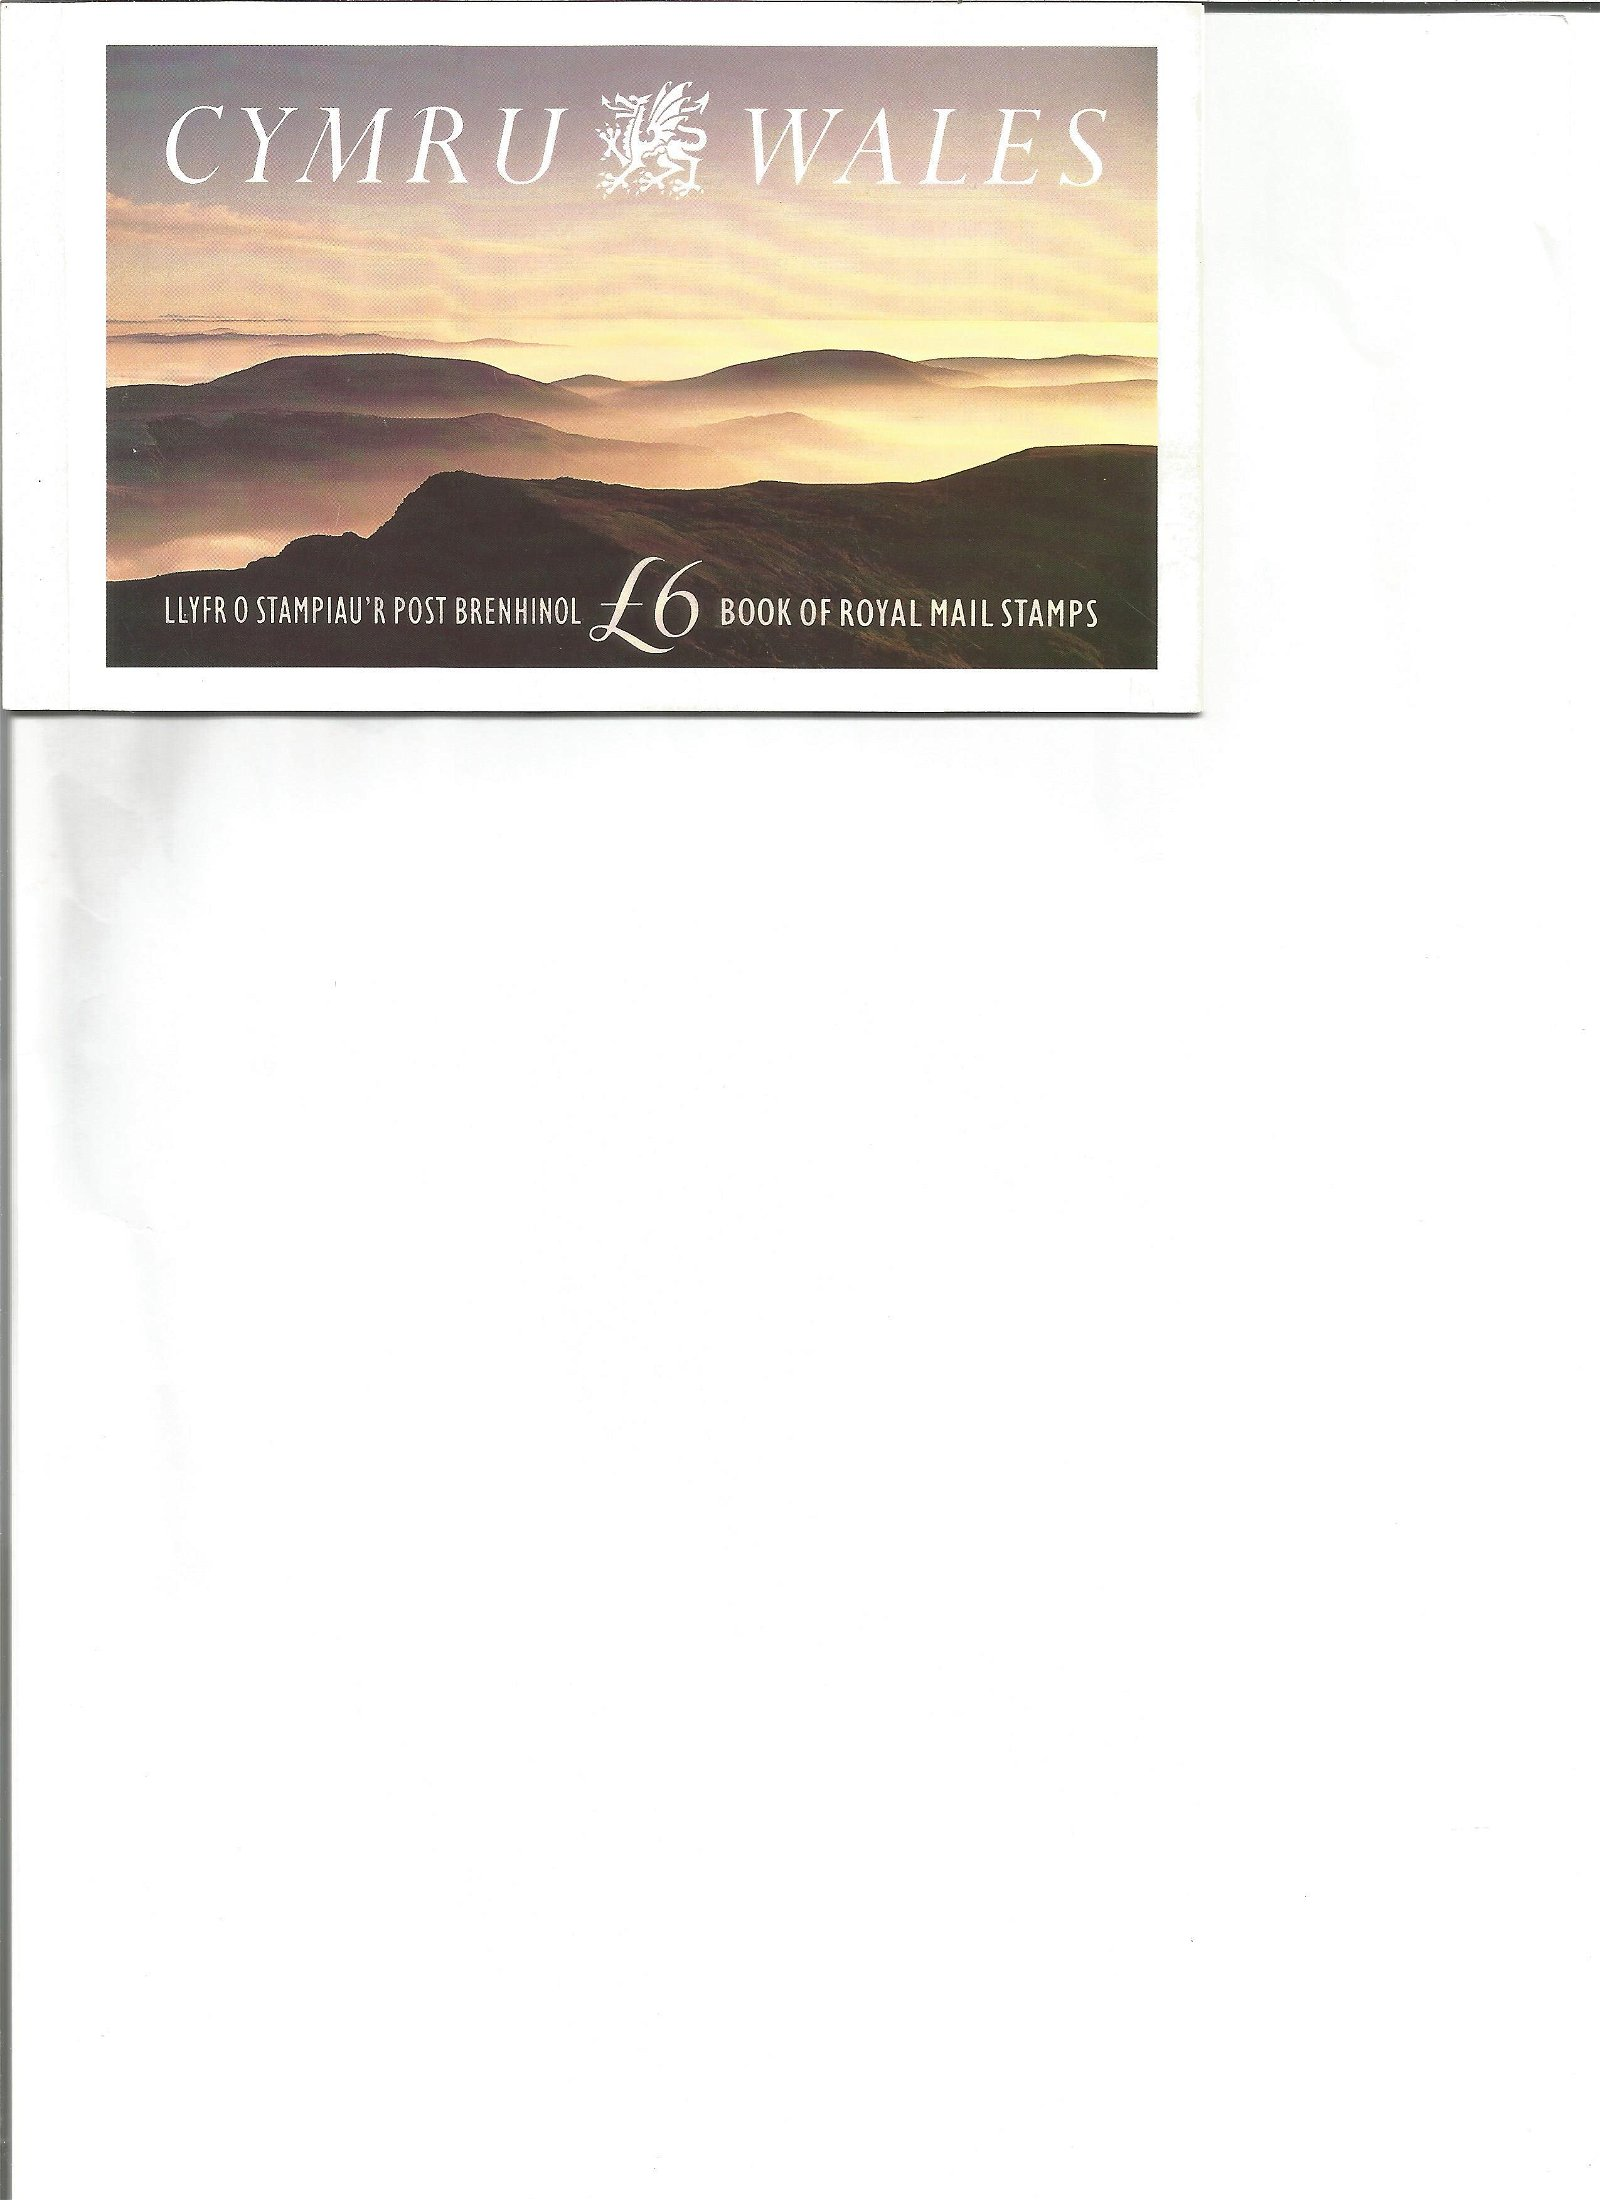 Royal Mail complete prestige stamp booklet Cymru Wales.